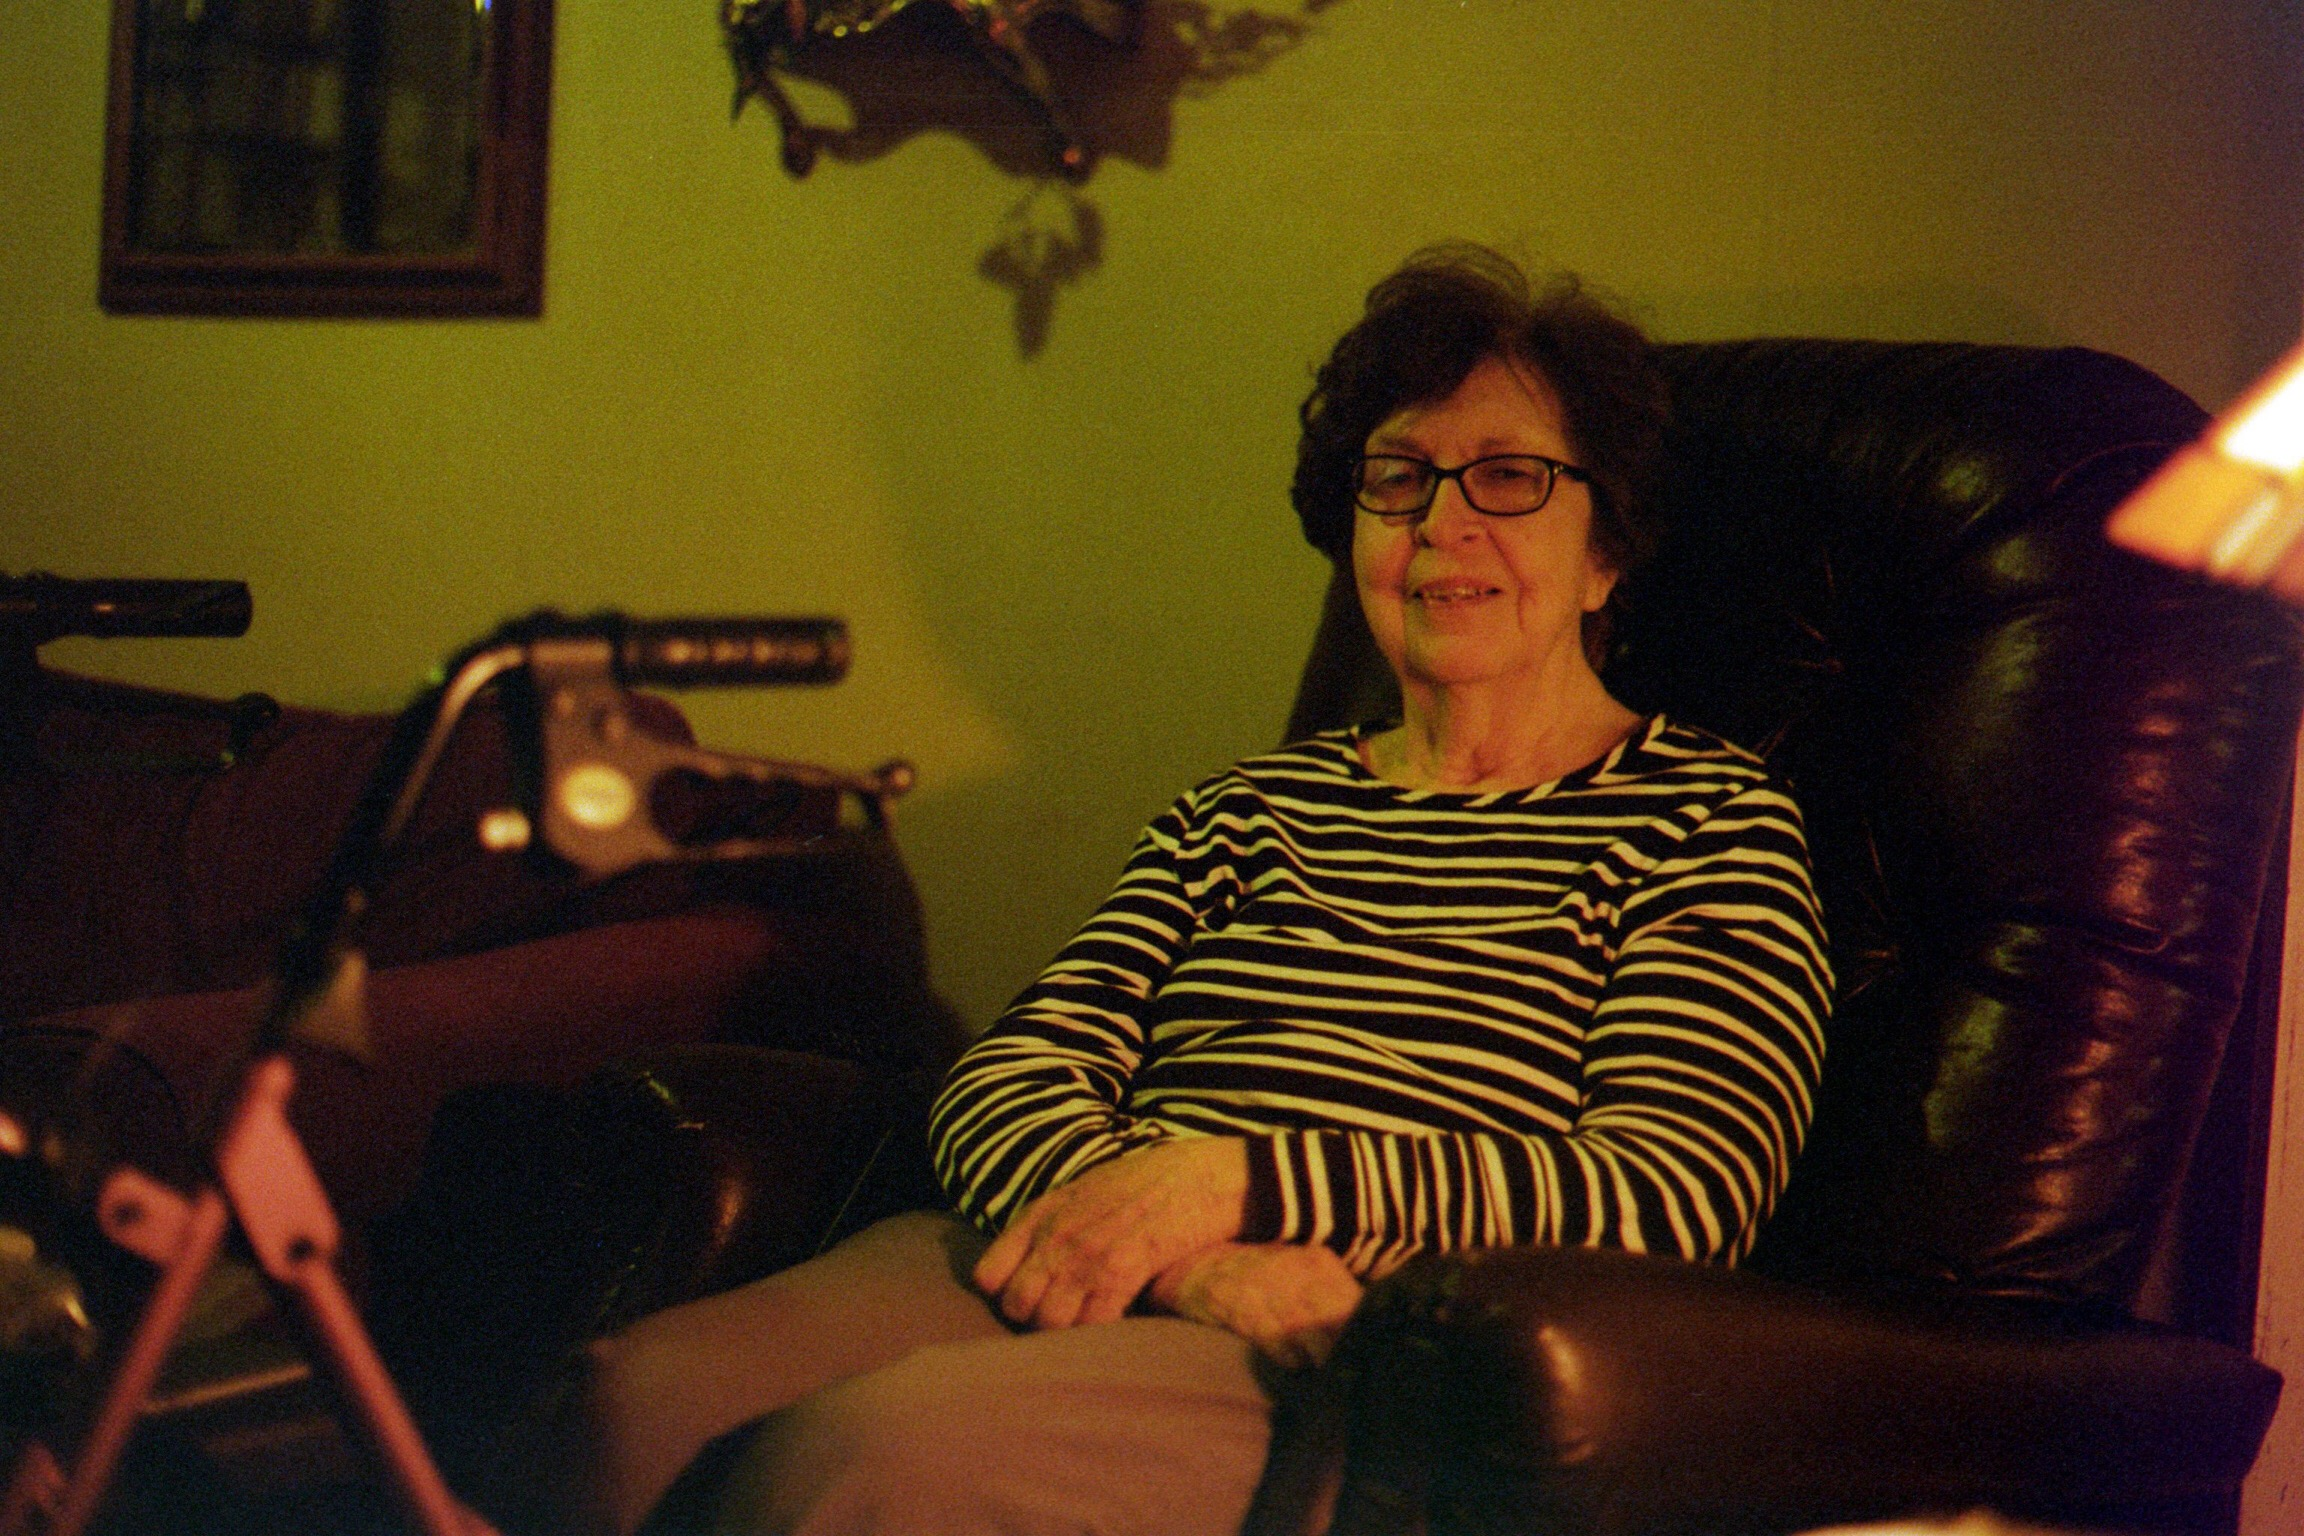 Pictured: Aunt Bonnie